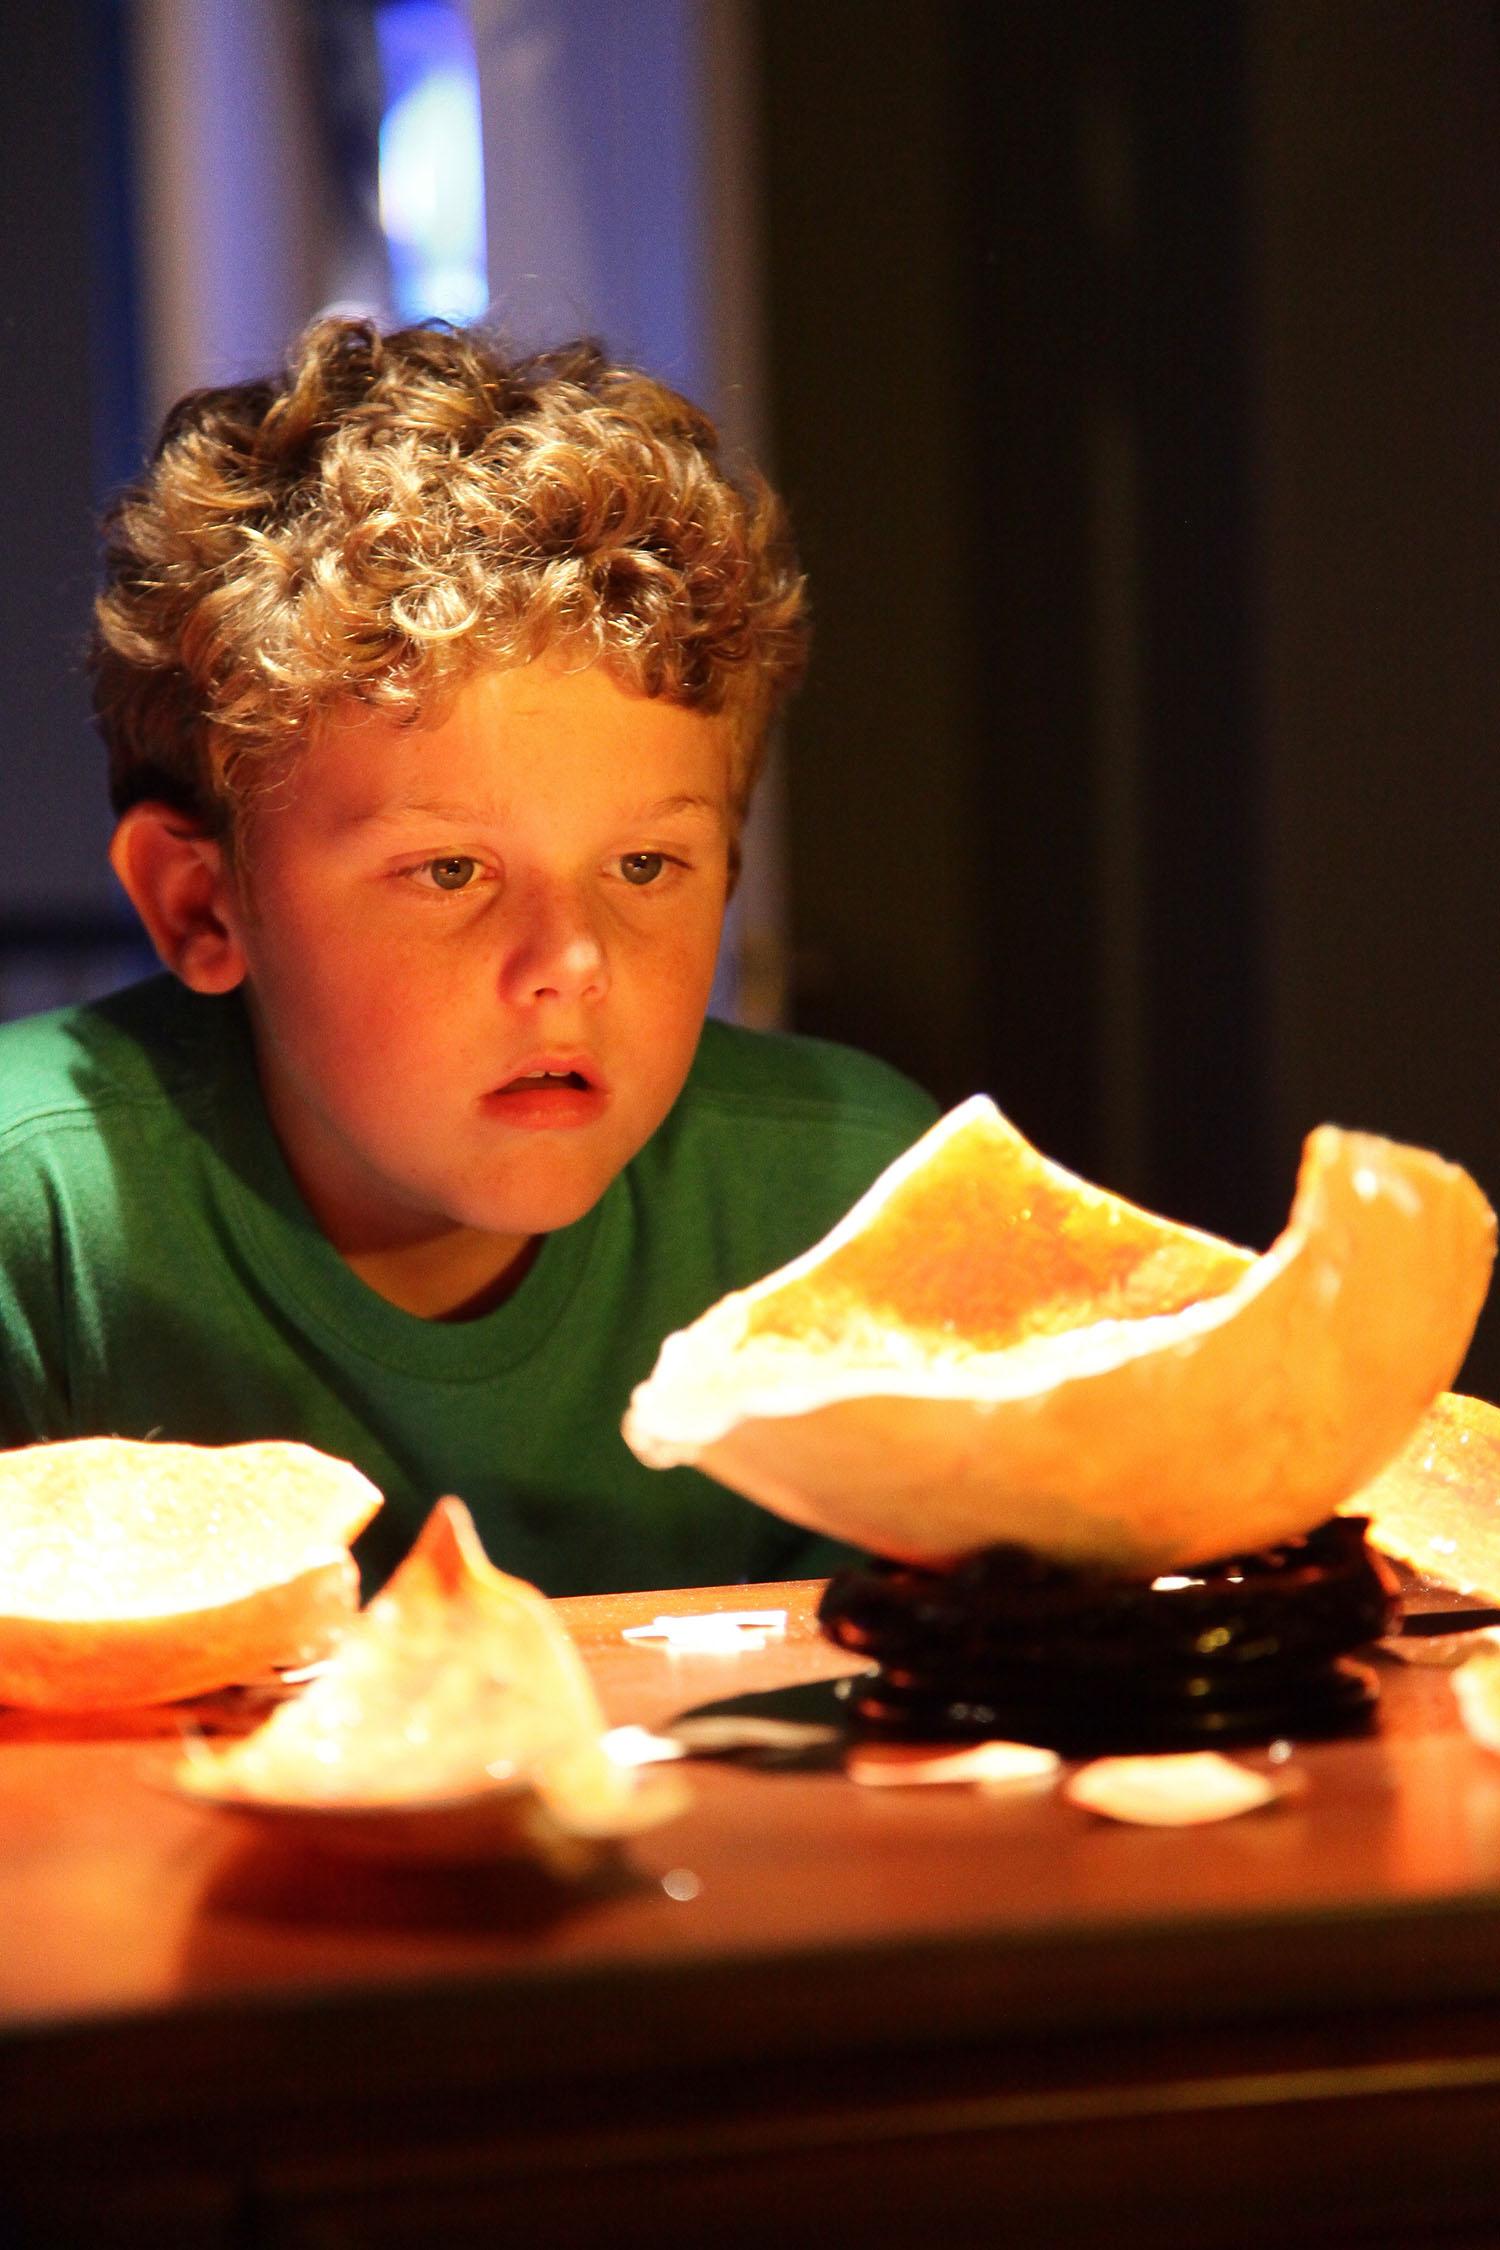 Sean Ryan Fox as David with Egg.jpg